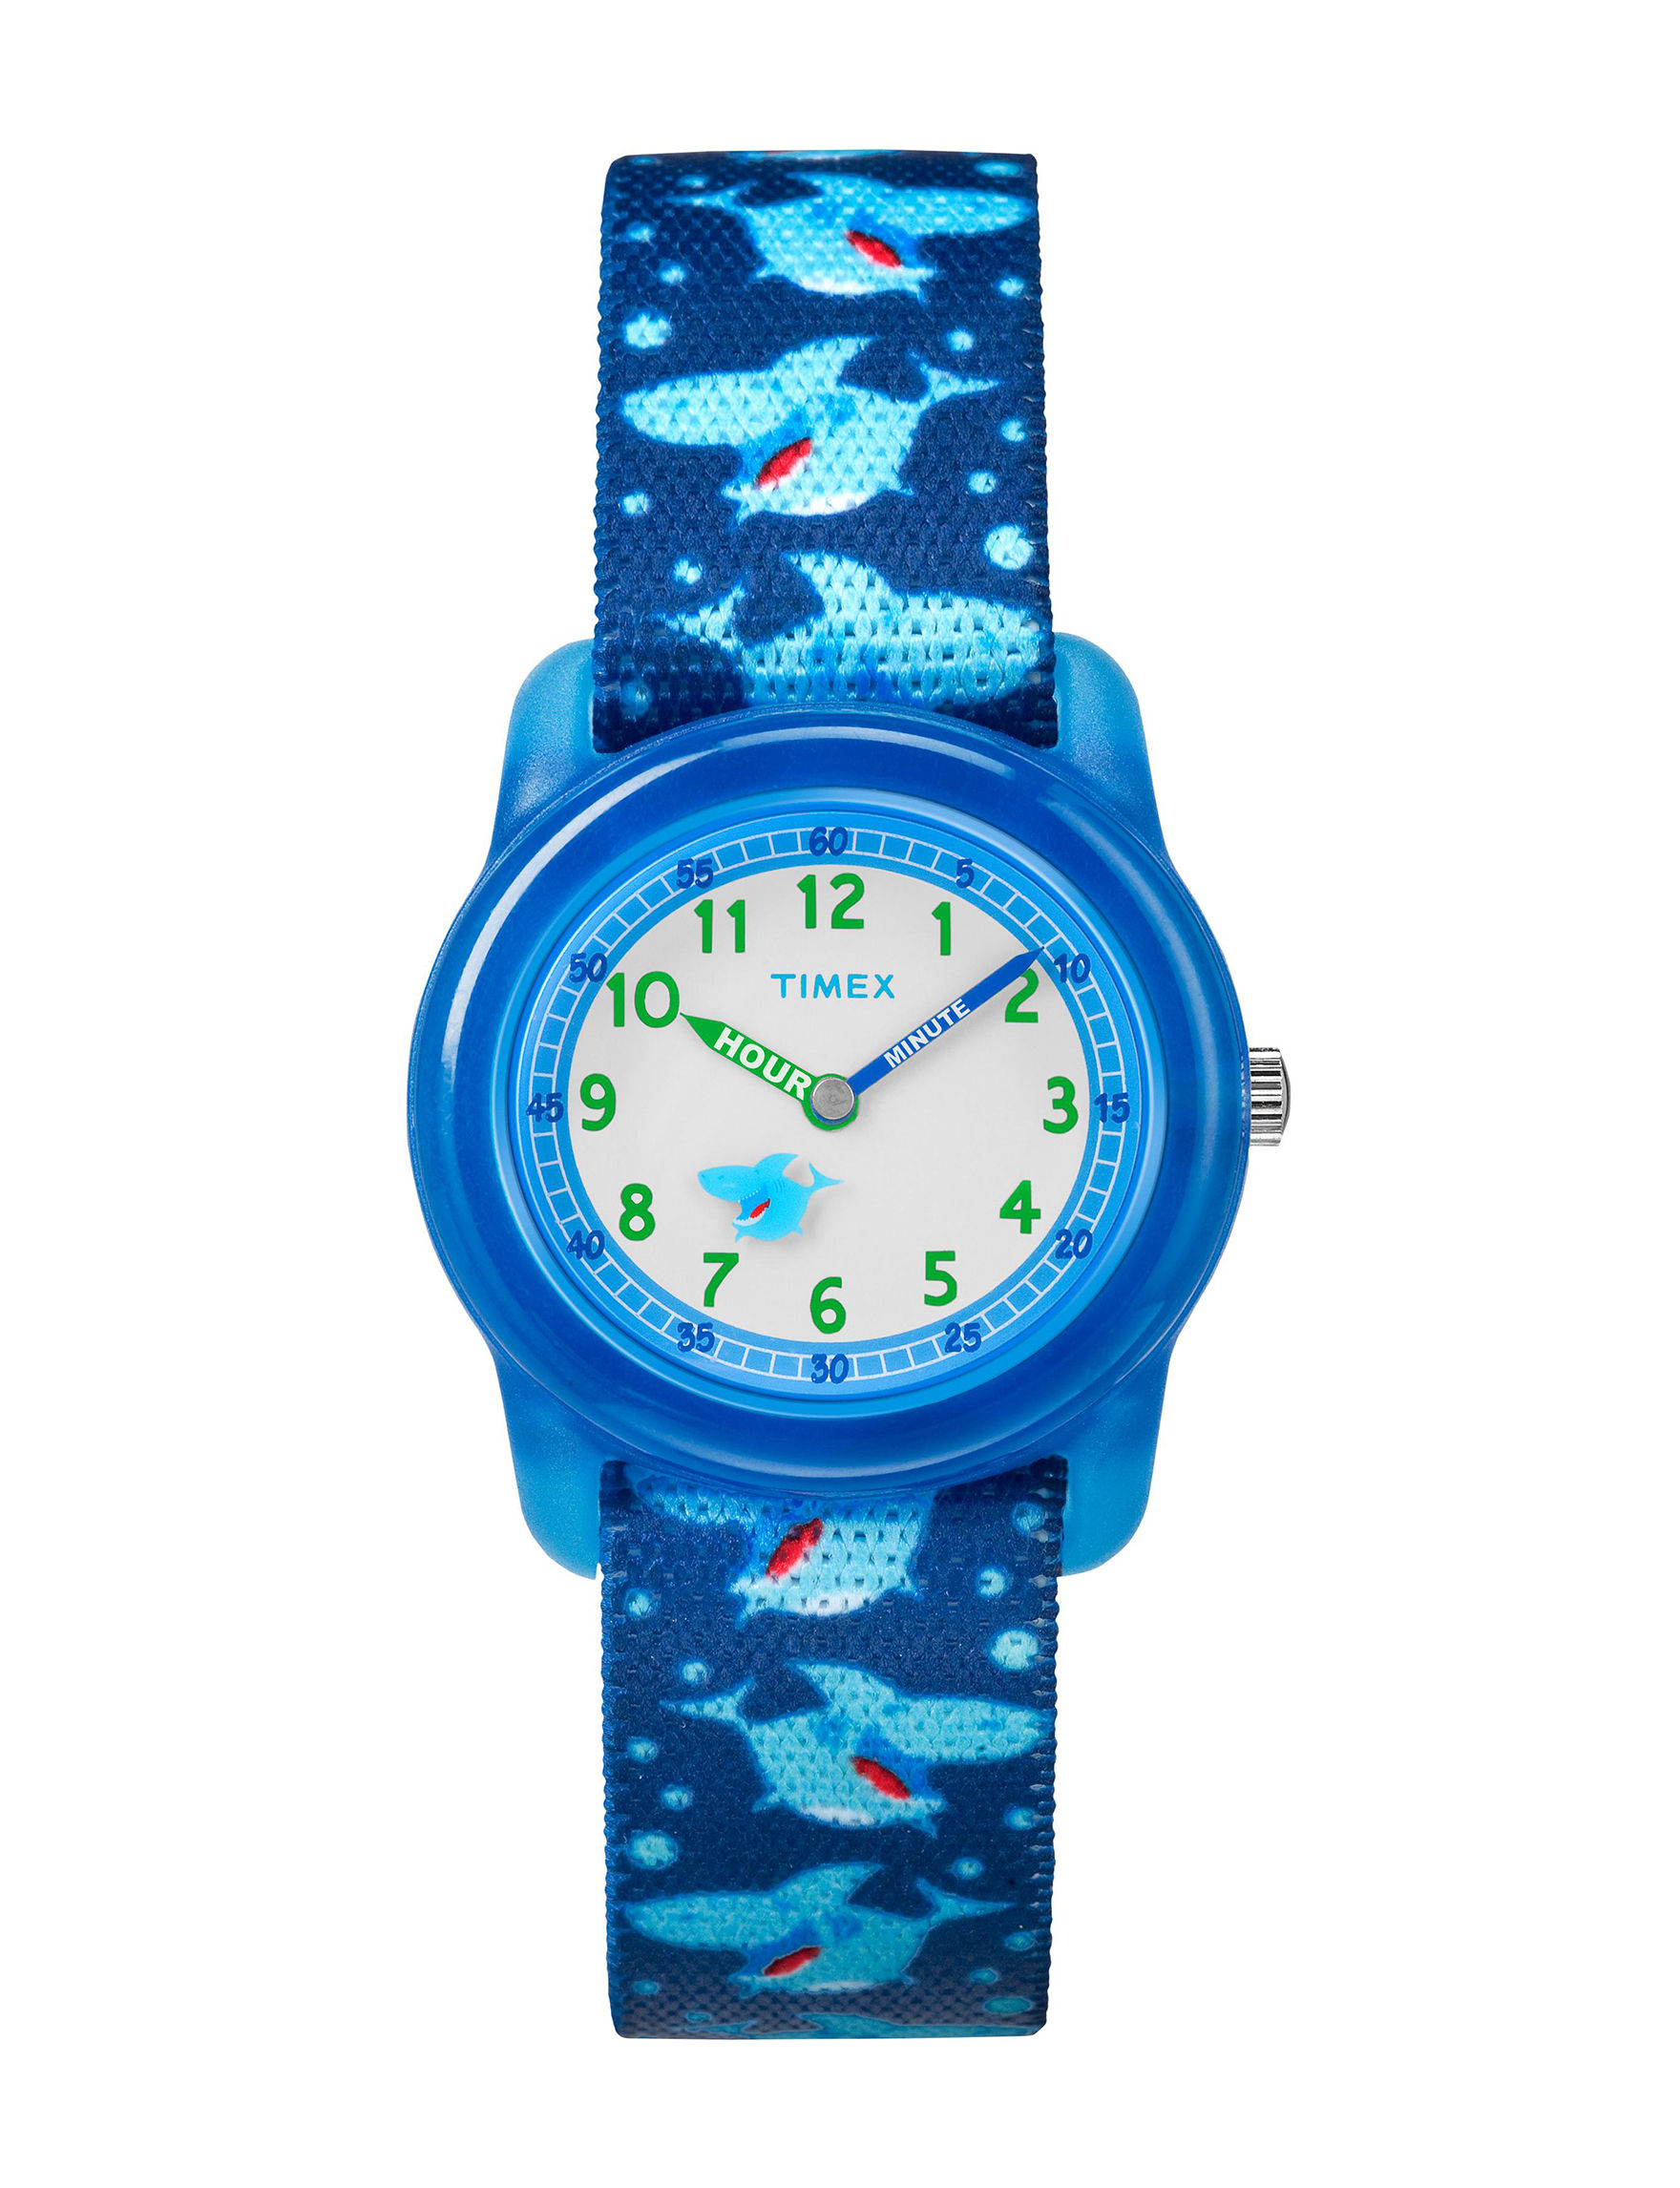 Timex Blue Fashion Watches